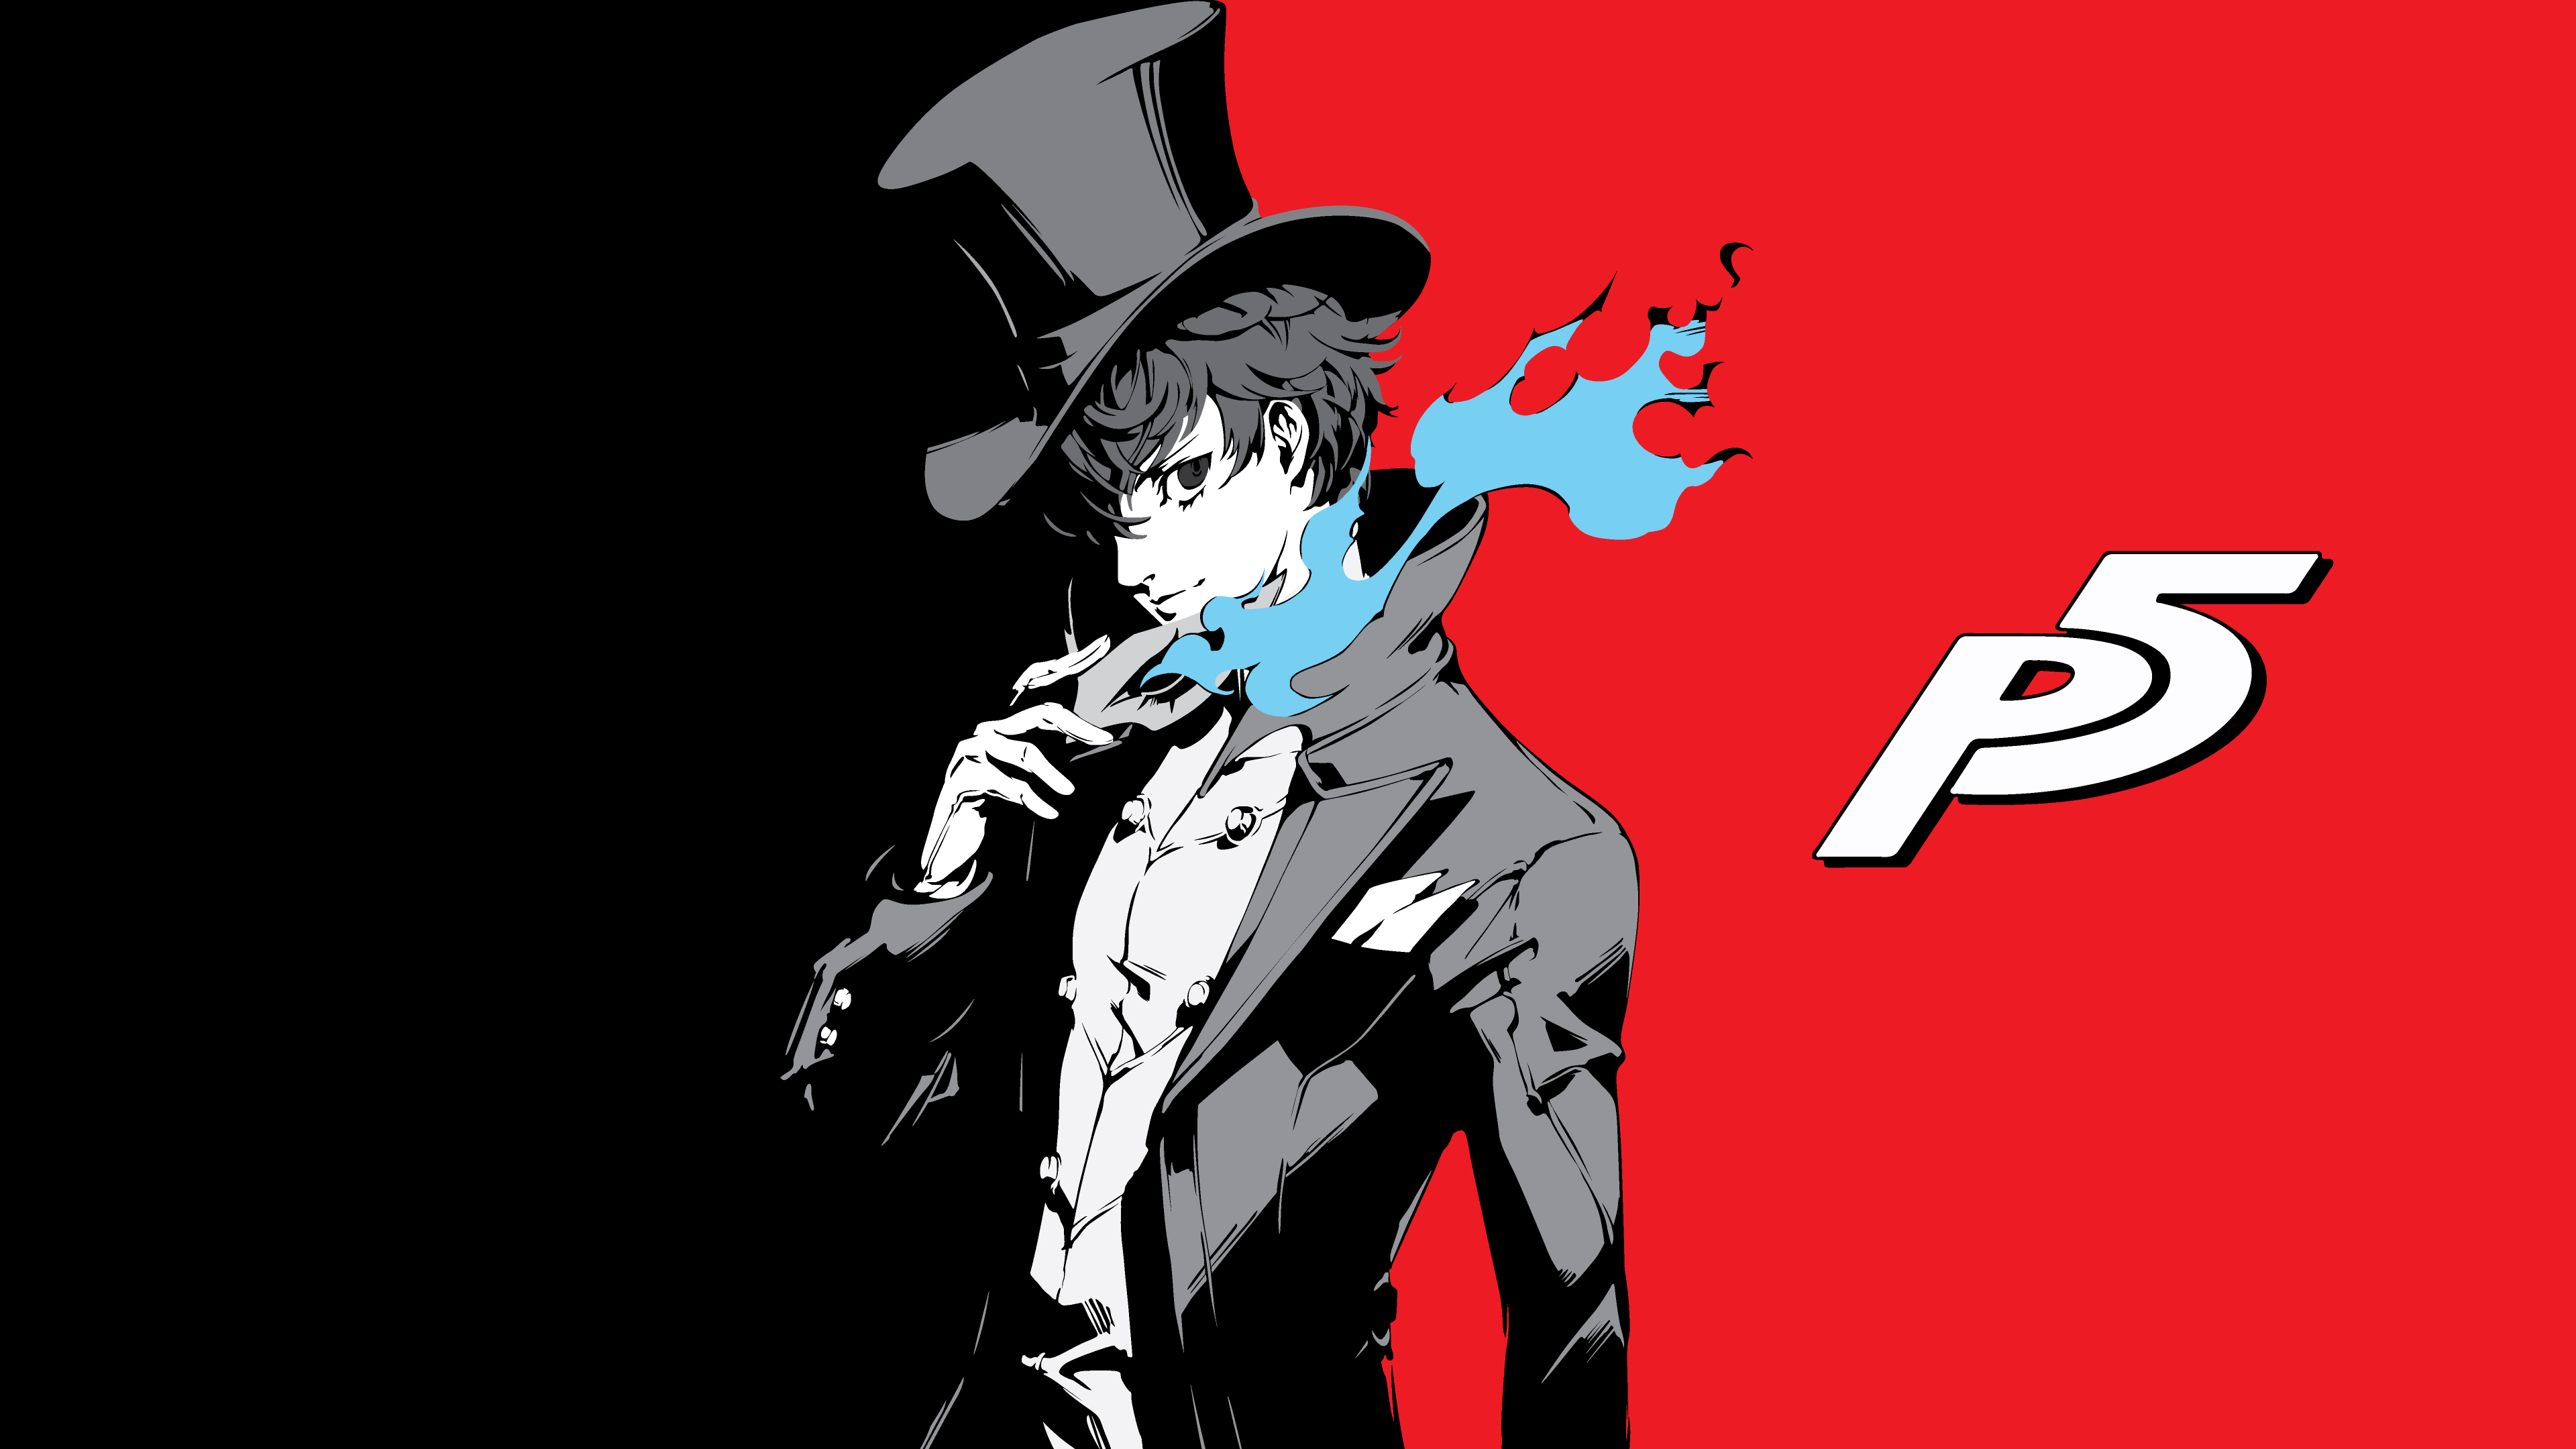 Persona 3 Wallpaper 4k: Persona 5 - Joker 4k Ultra HD Wallpaper